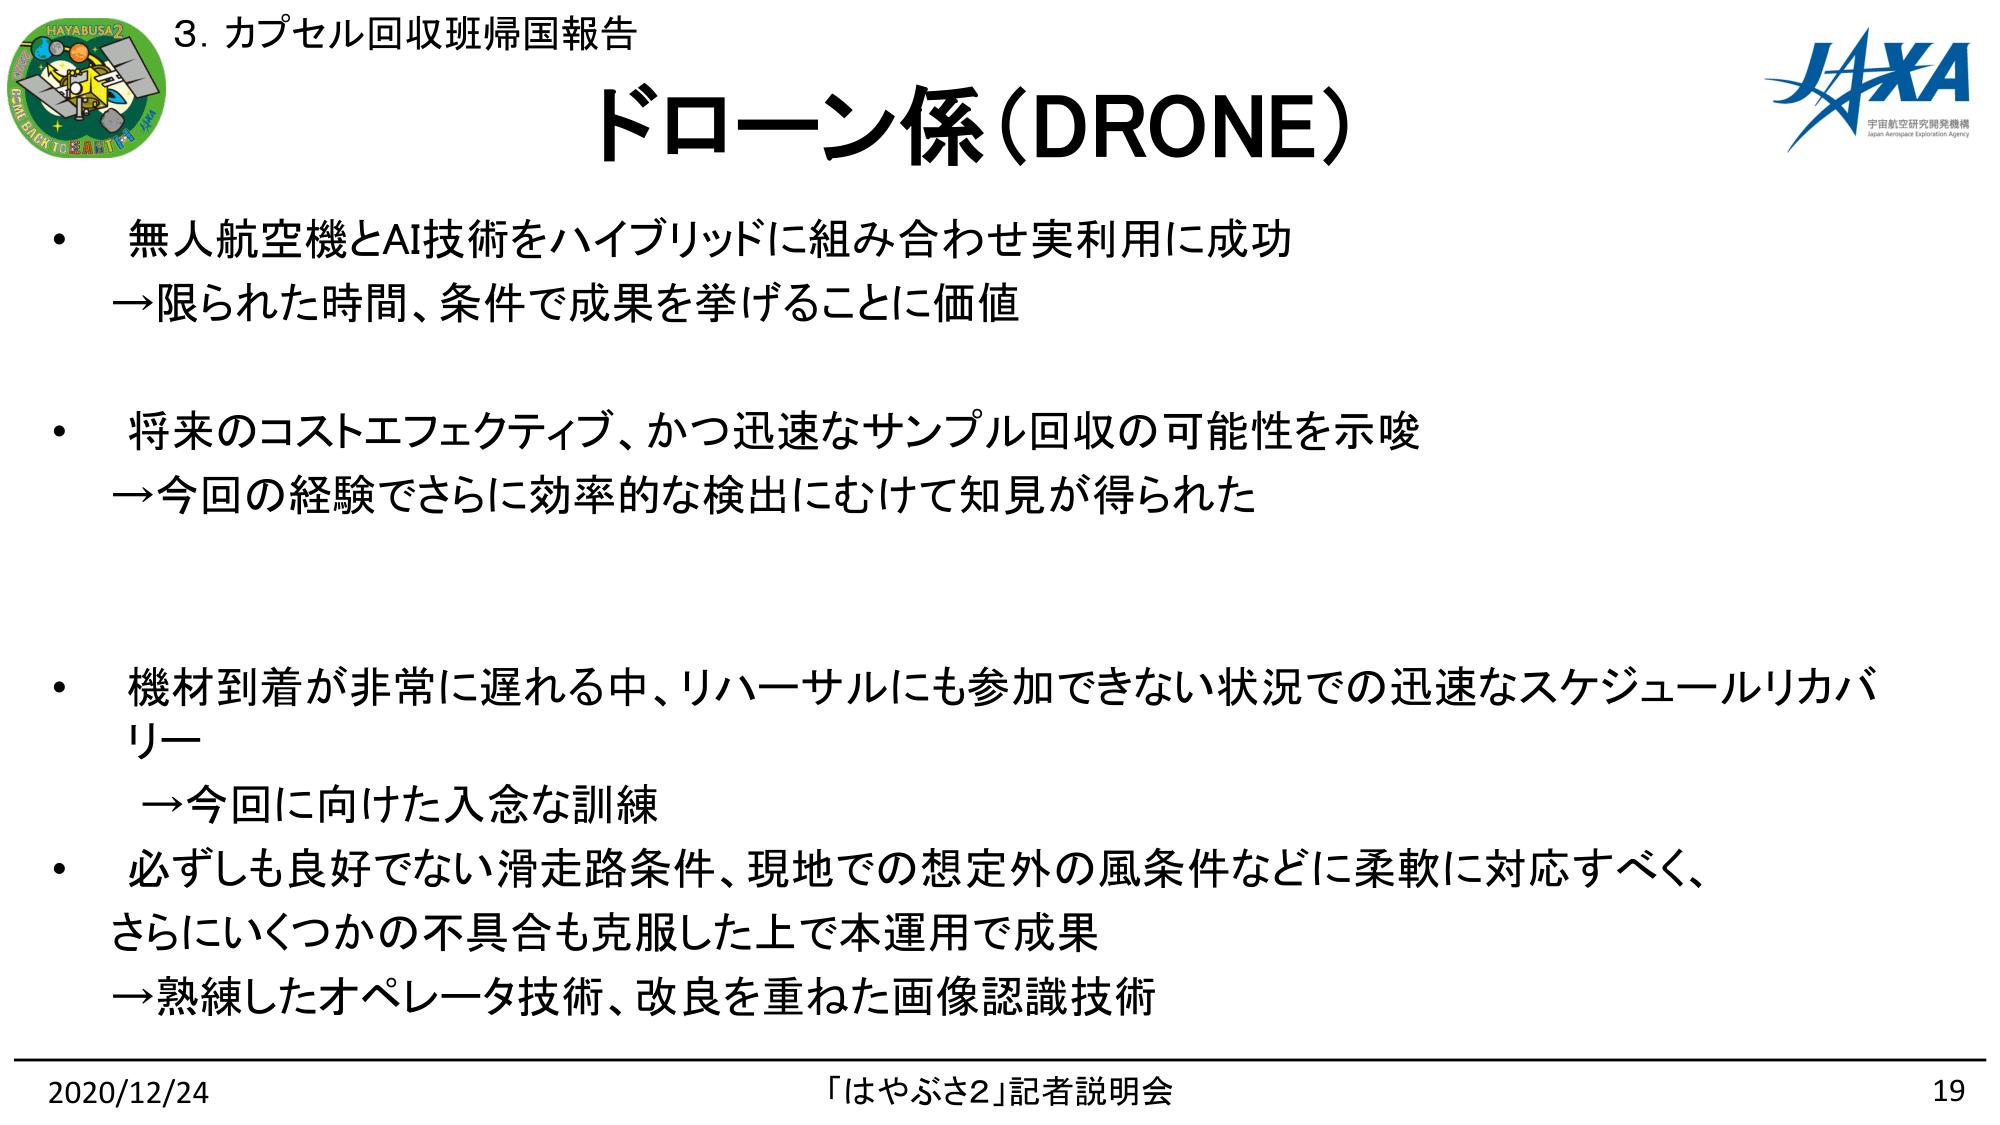 f:id:Imamura:20201224135203p:plain